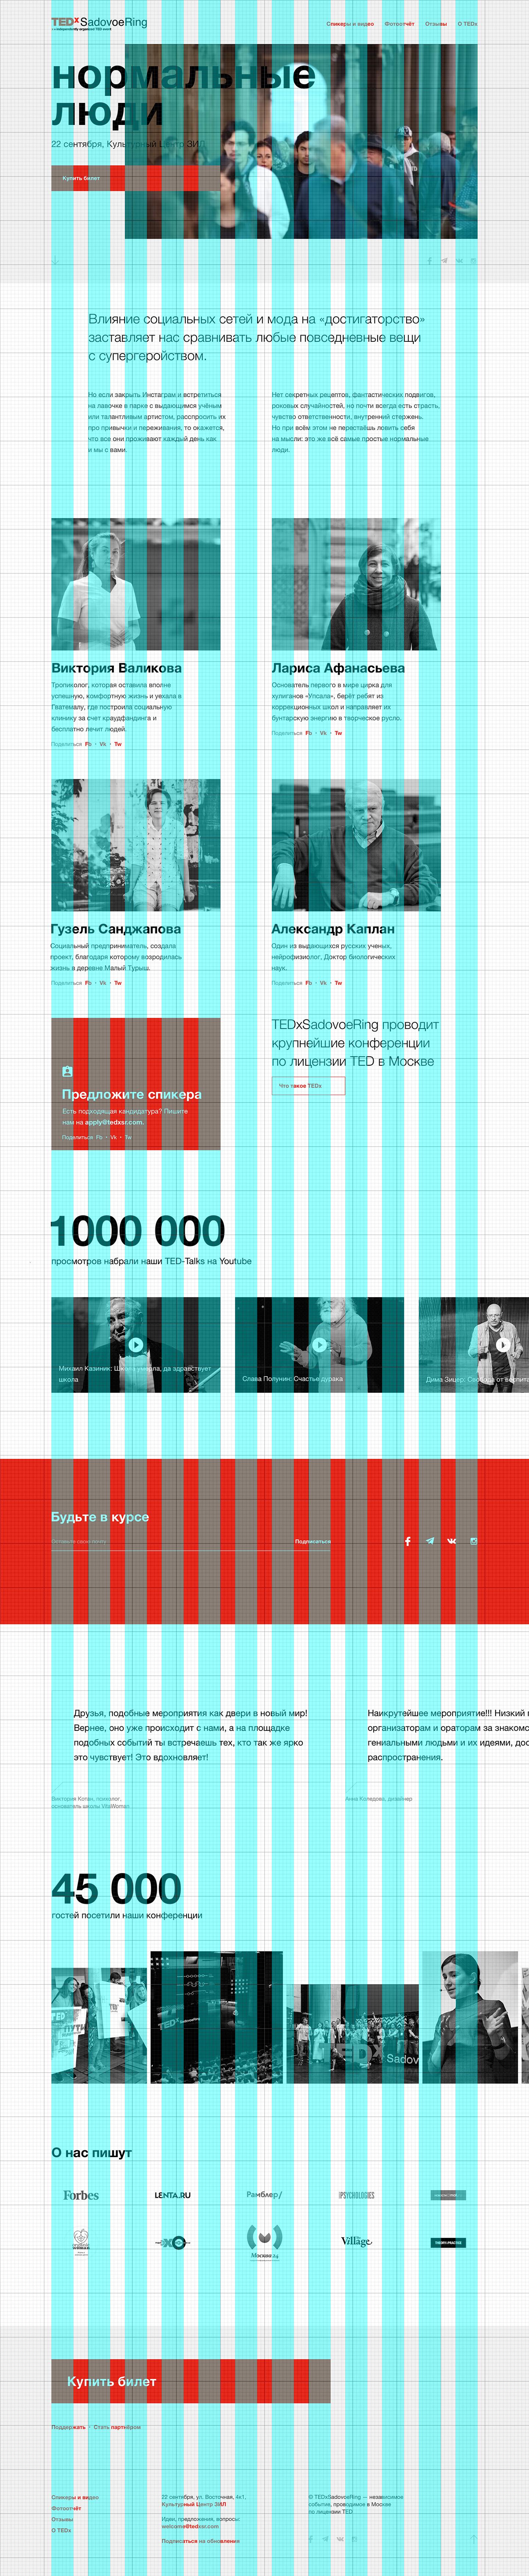 Tedxsr main desktop 1440 grid